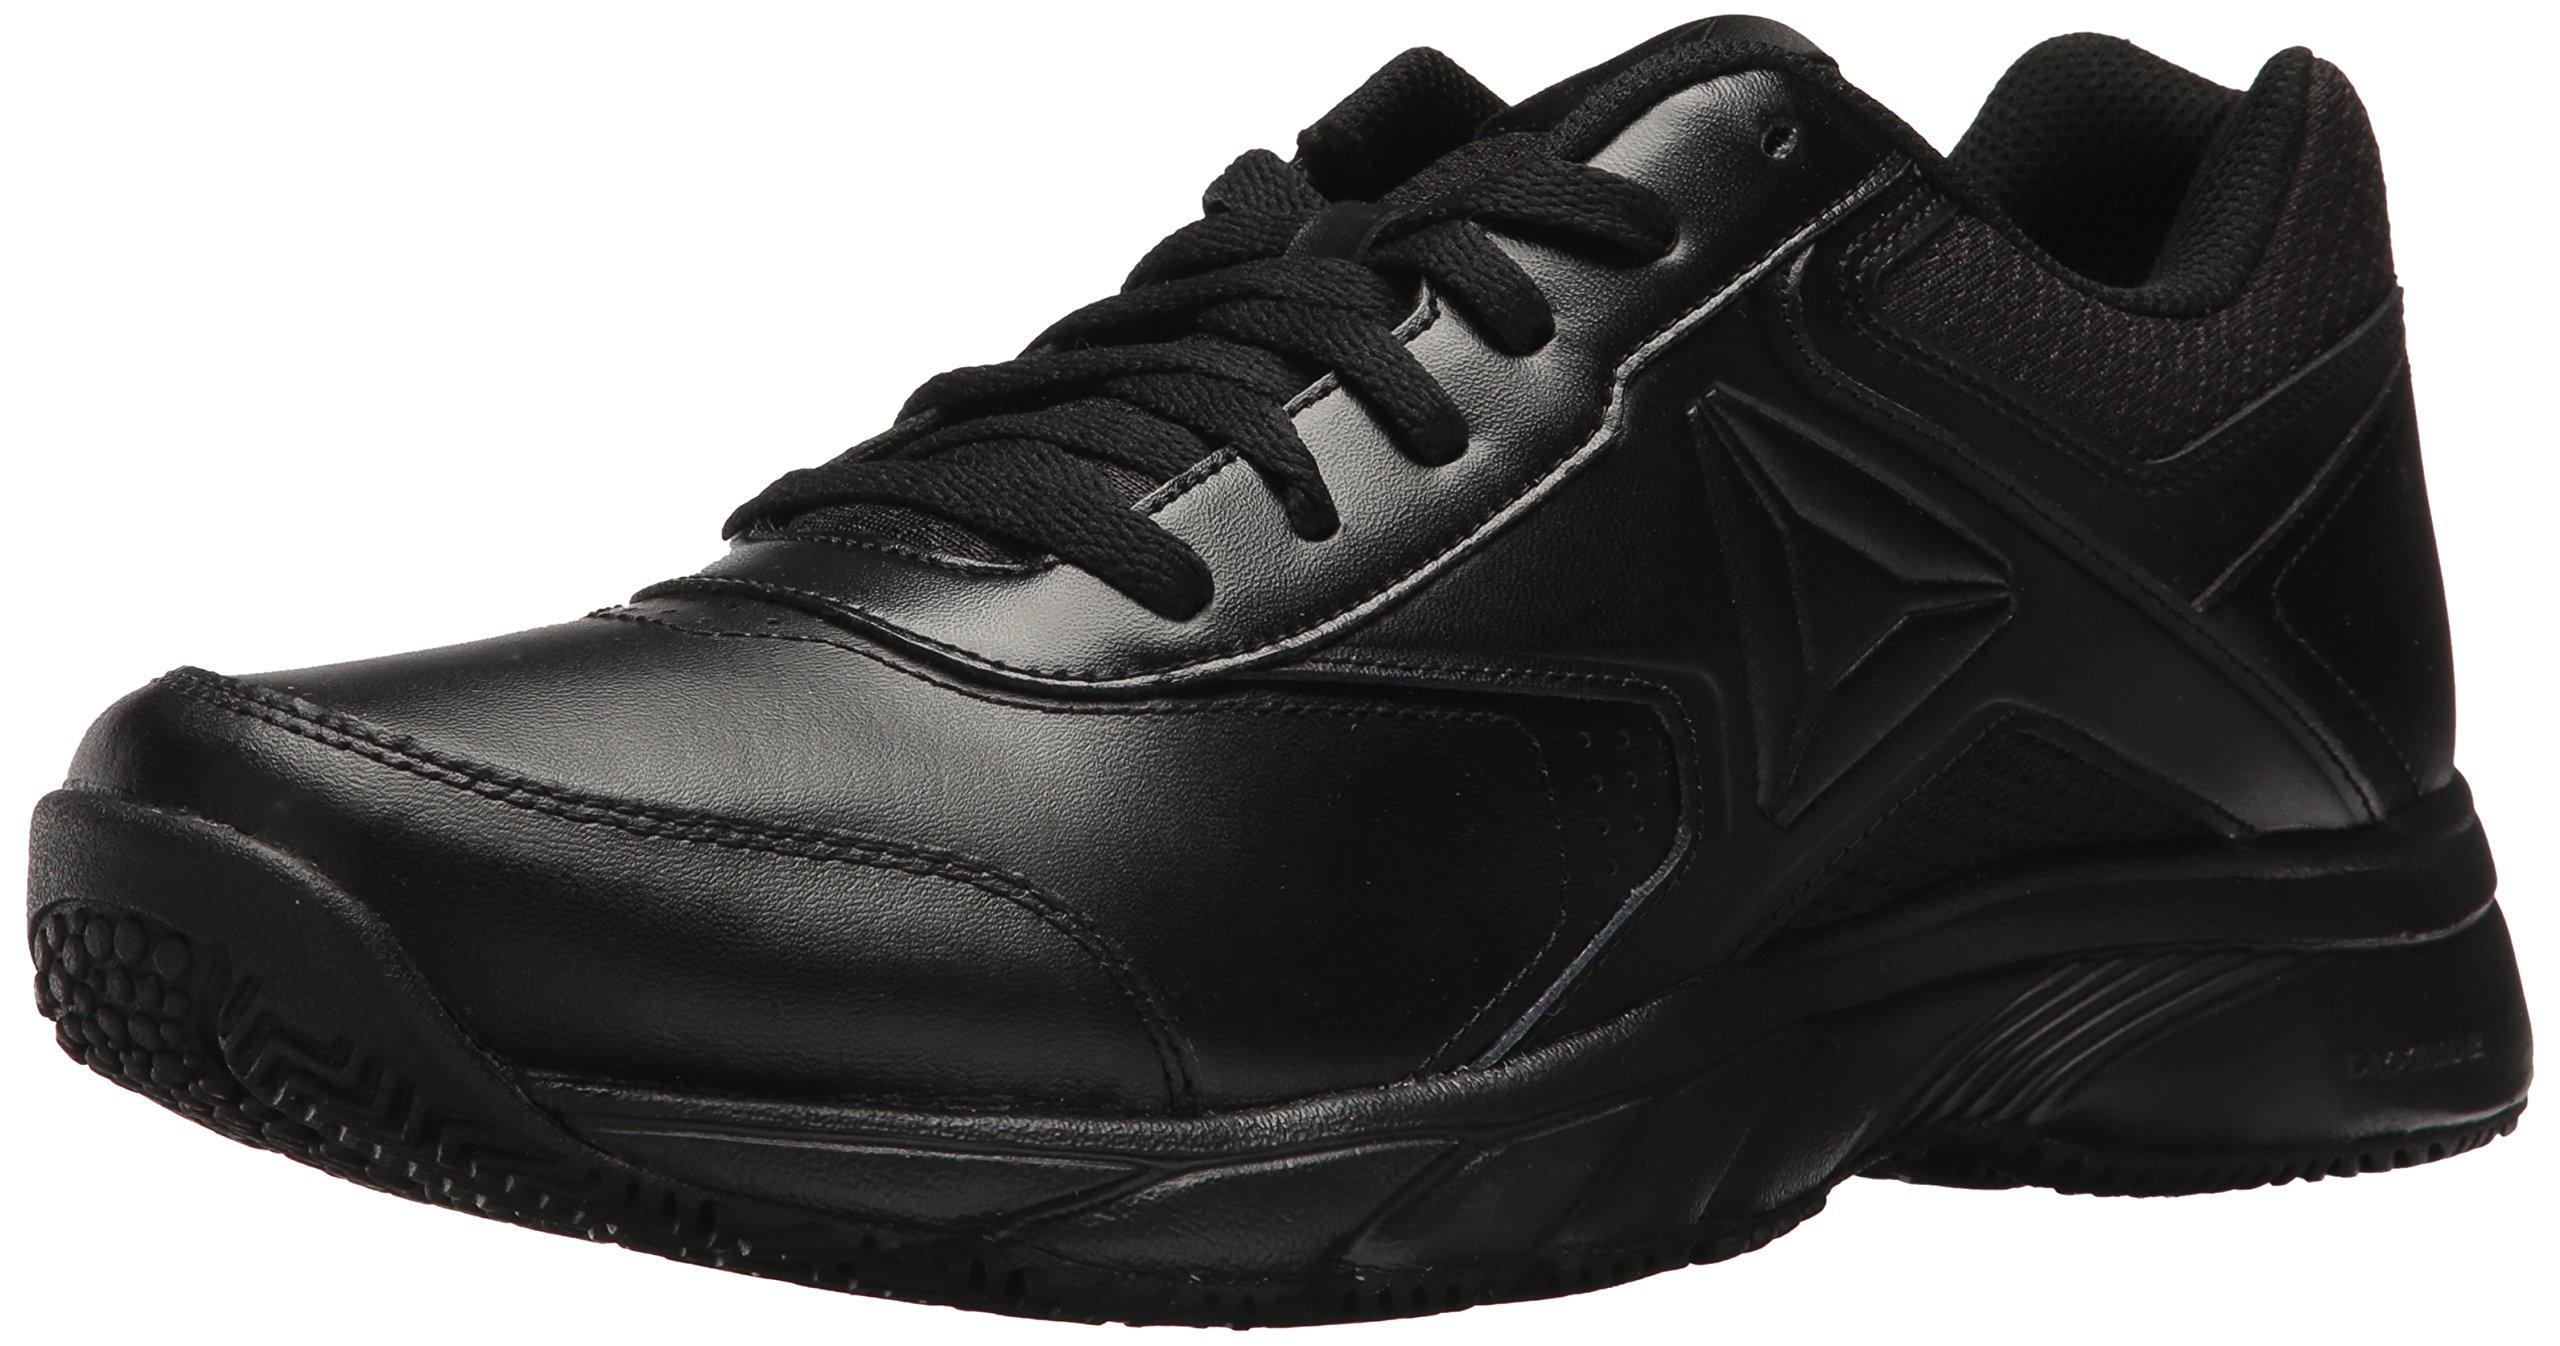 Reebok Men's Work N Cushion 3.0 Walking Shoe, Black, 13 M US by Reebok